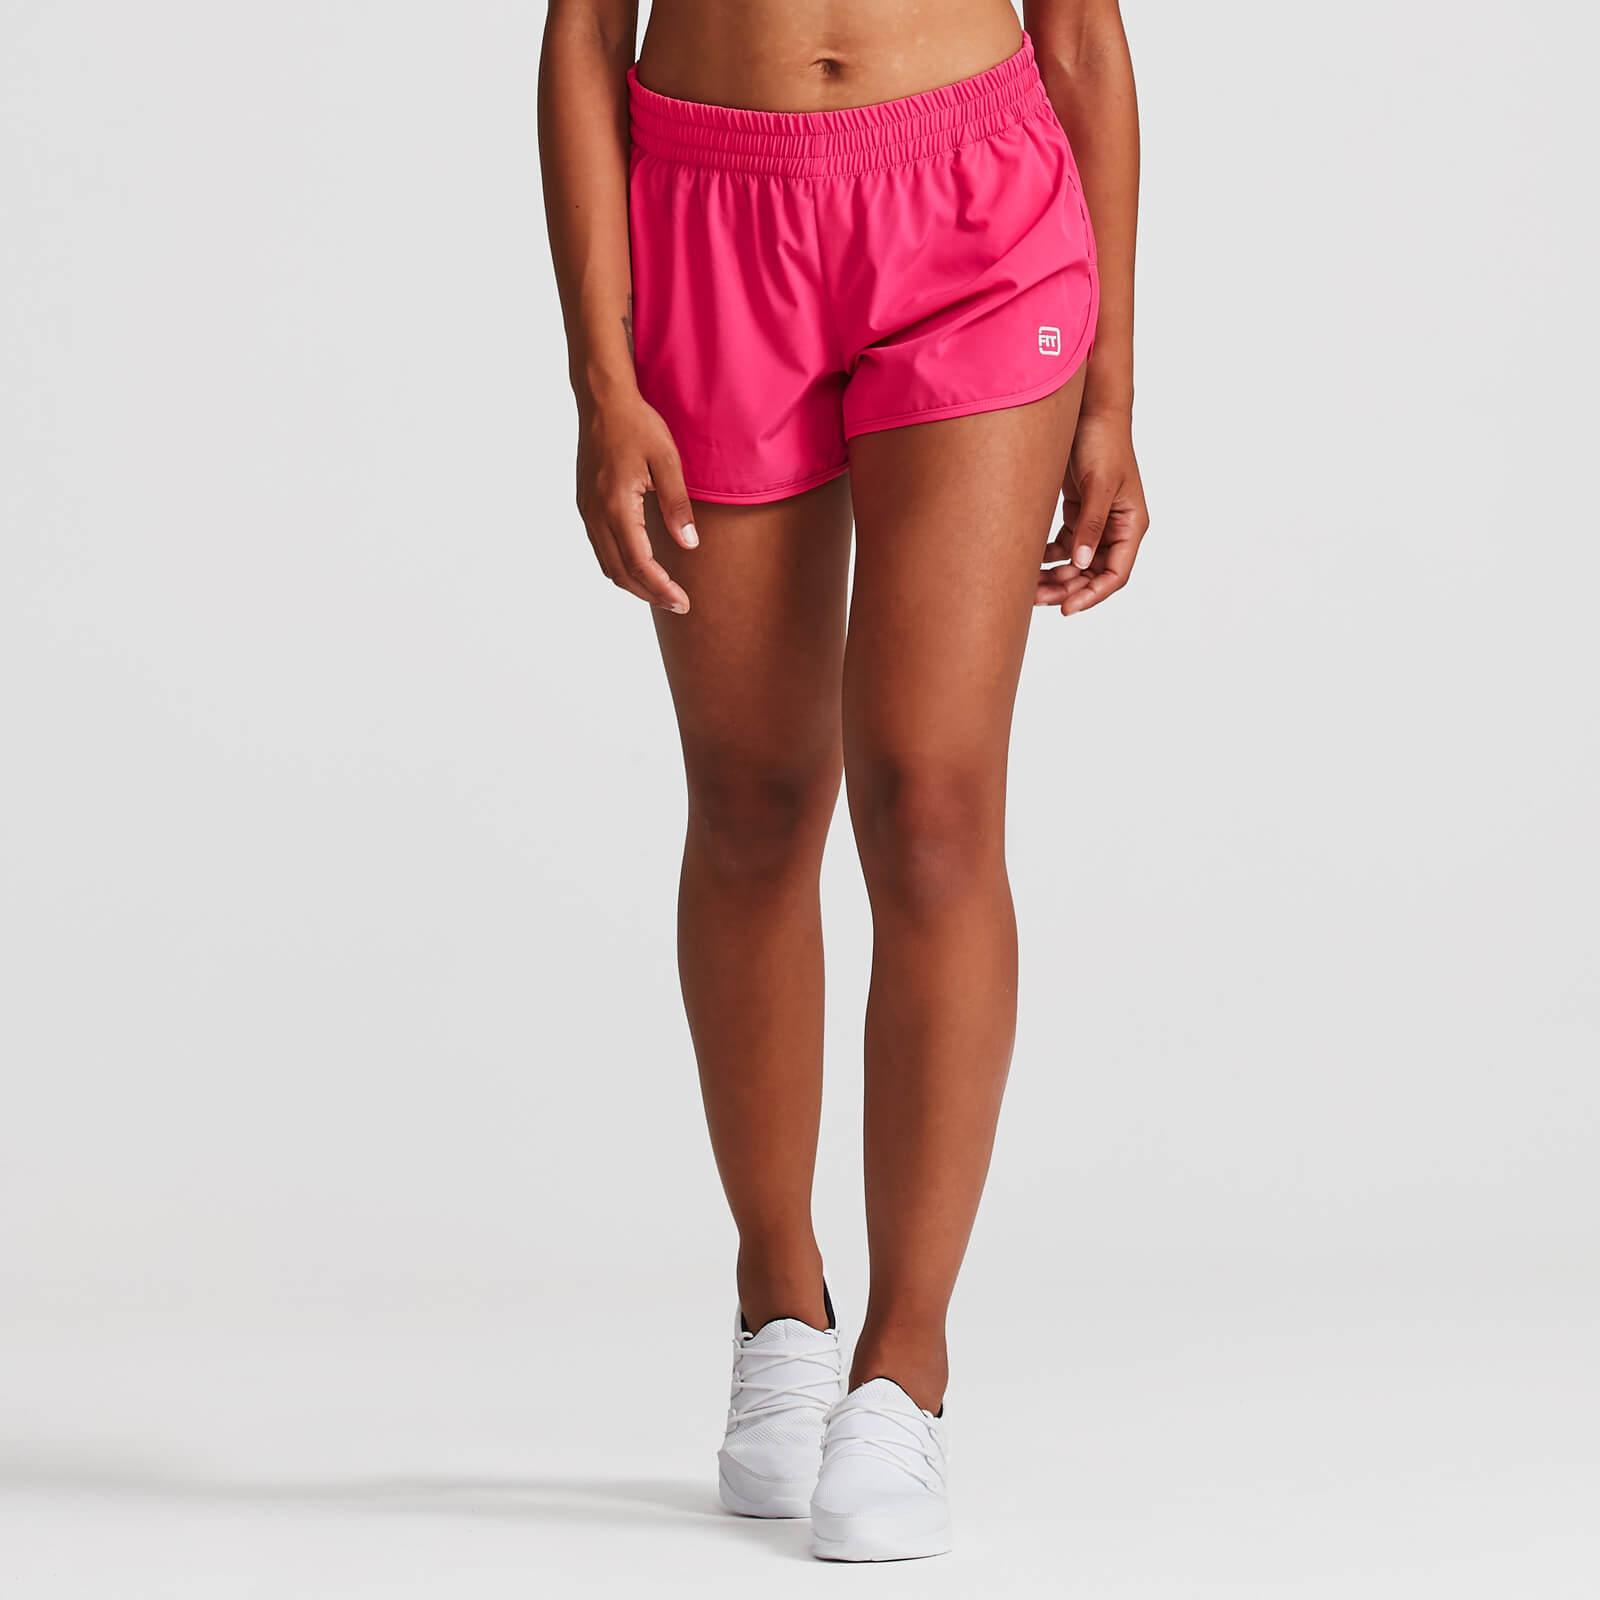 IdealFit 4-Way Stretch Shorts - Pink - XL - Pink